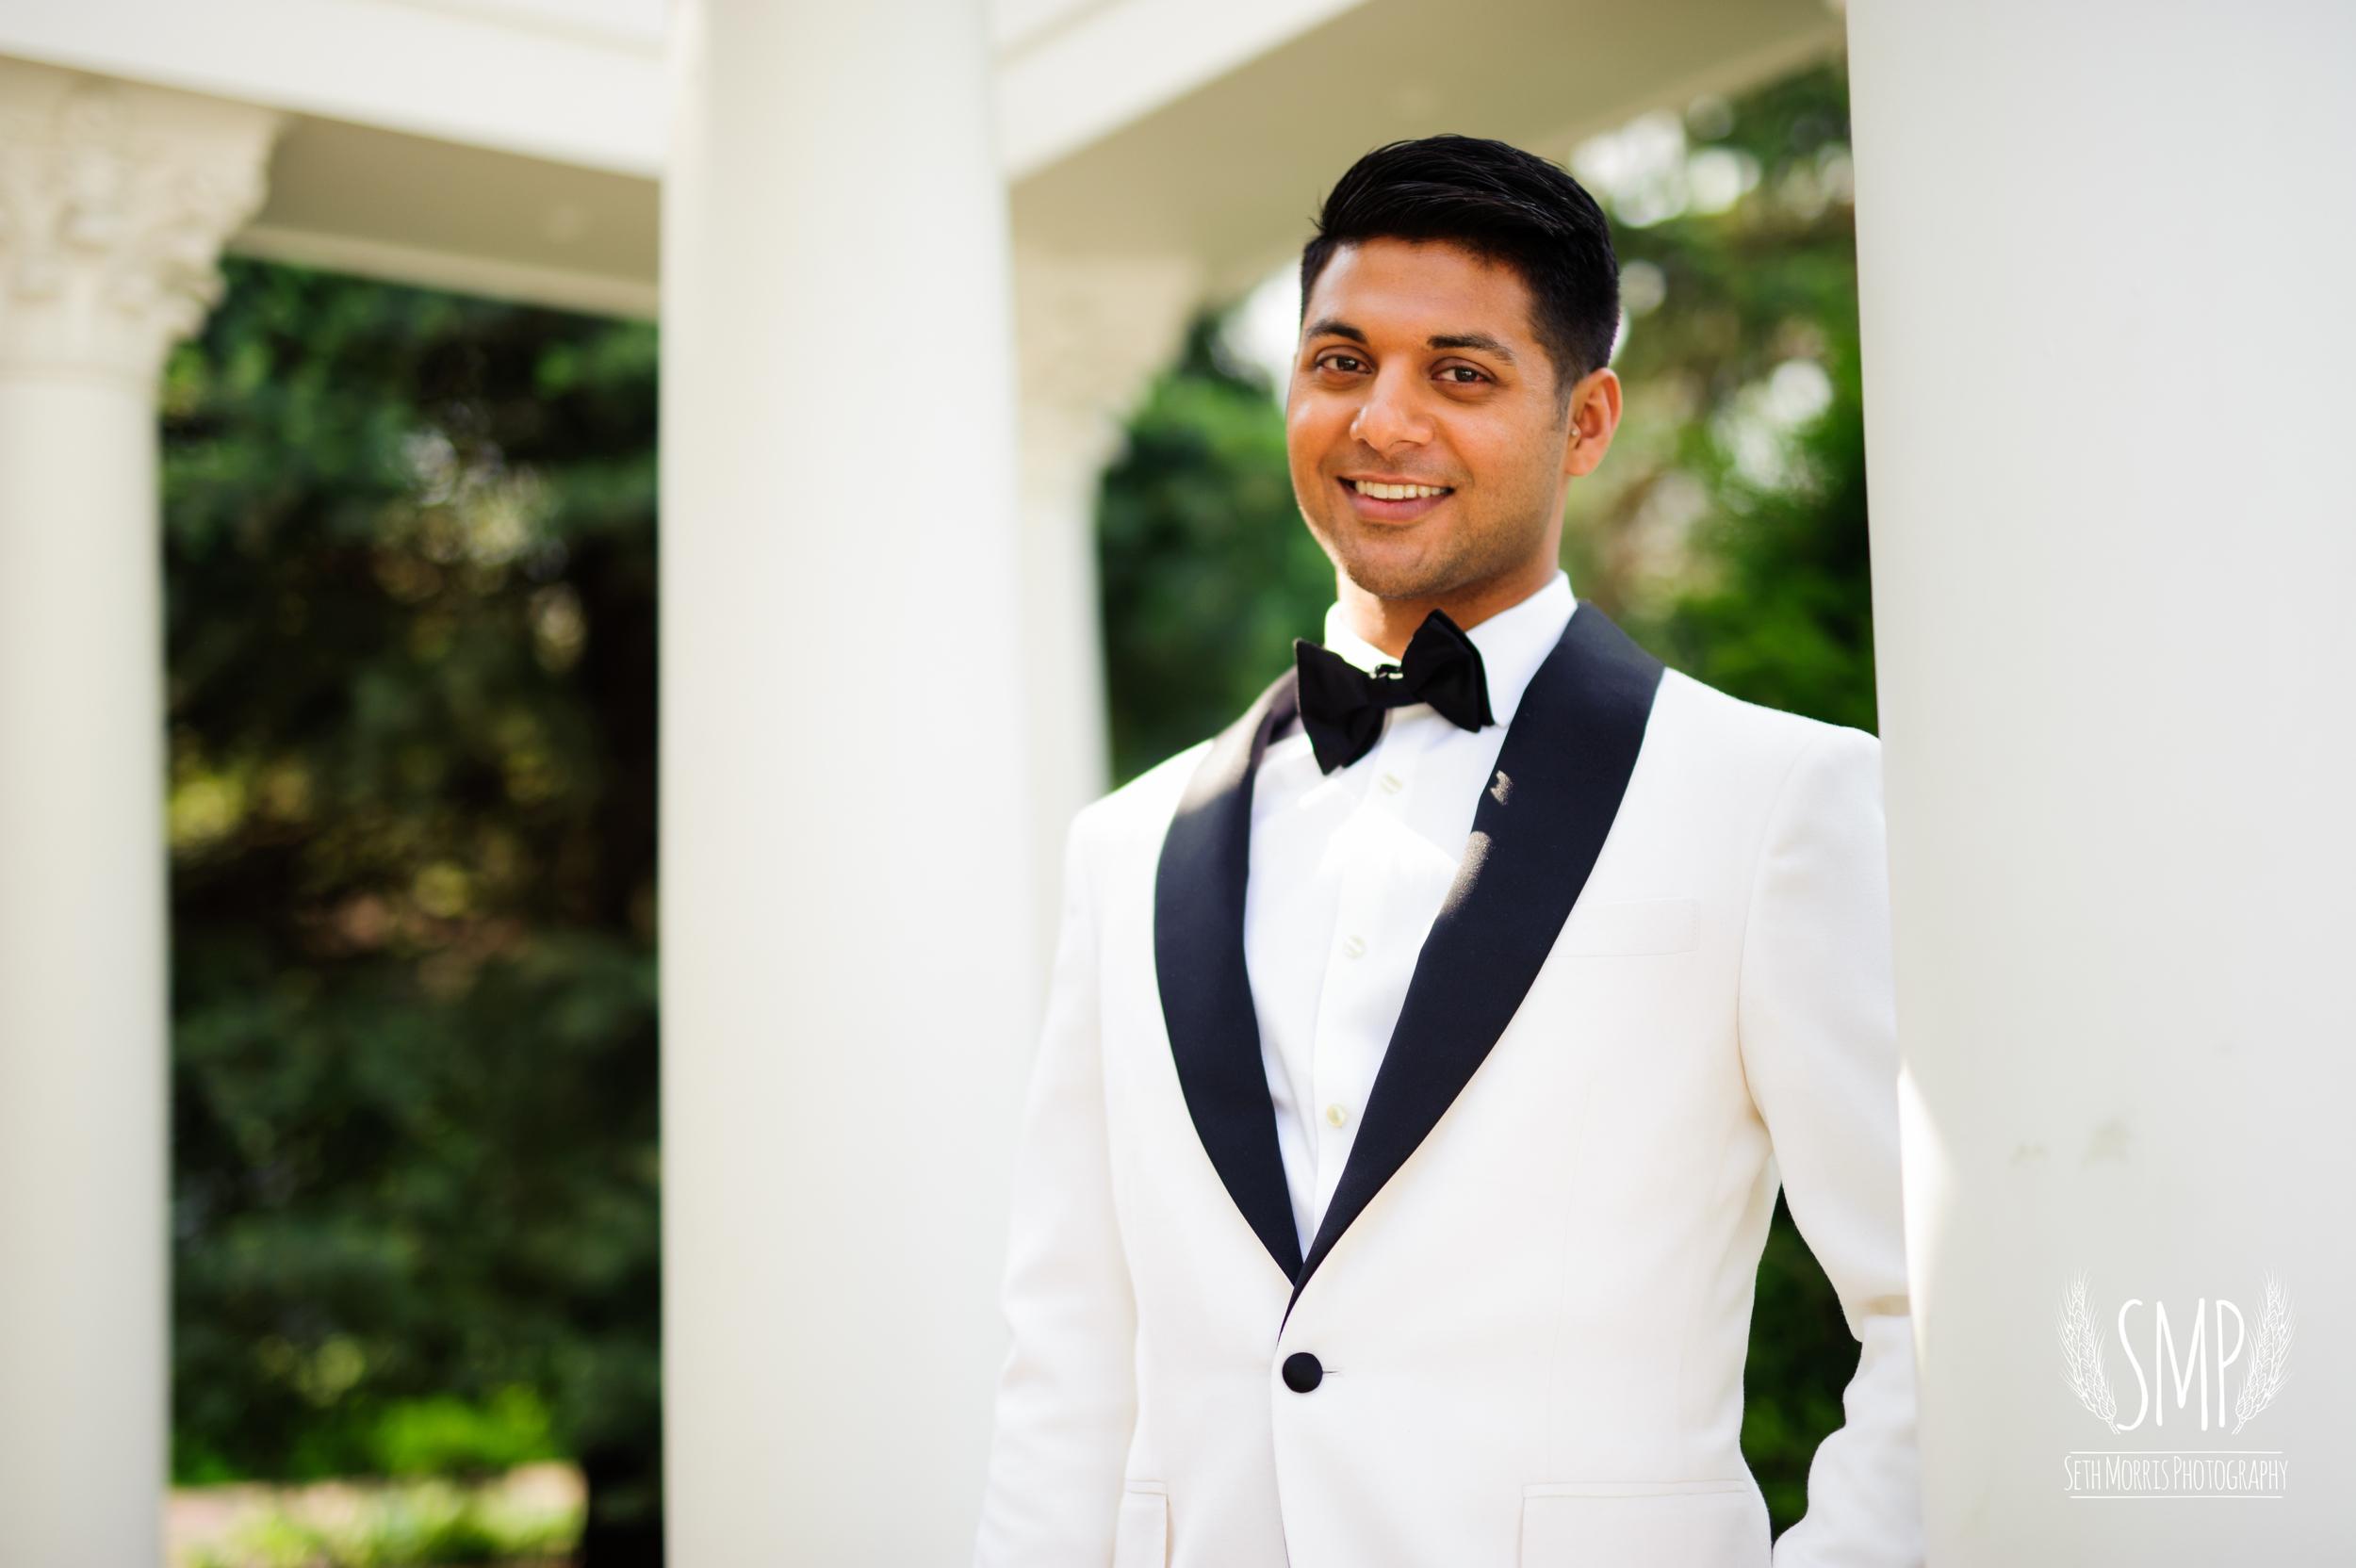 same-sex-wedding-photographer-chicago-illinois-35.jpg